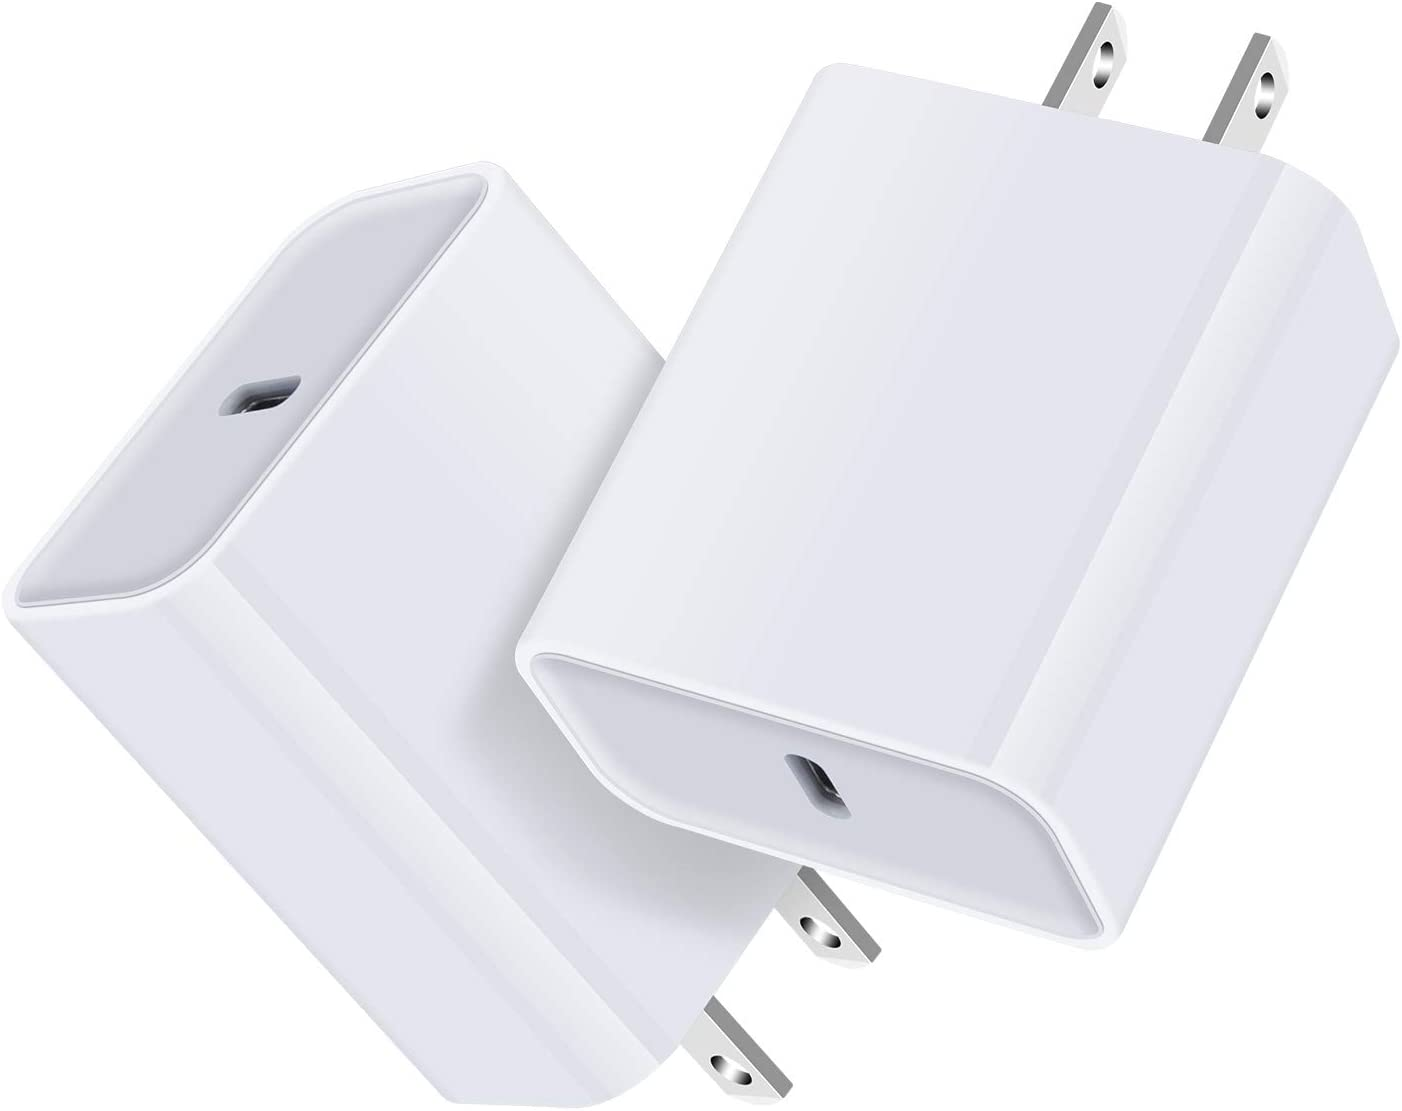 USBCCharger,18WPDPowerAdapter2PackUSBCBoxBlockBrickPlugFastChargingBaseCube for iPhone 12 Mini/11 Pro Max XR XS X SE 8 Plus Samsung Galaxy S20 10+ Note 20 Ultra Pixel